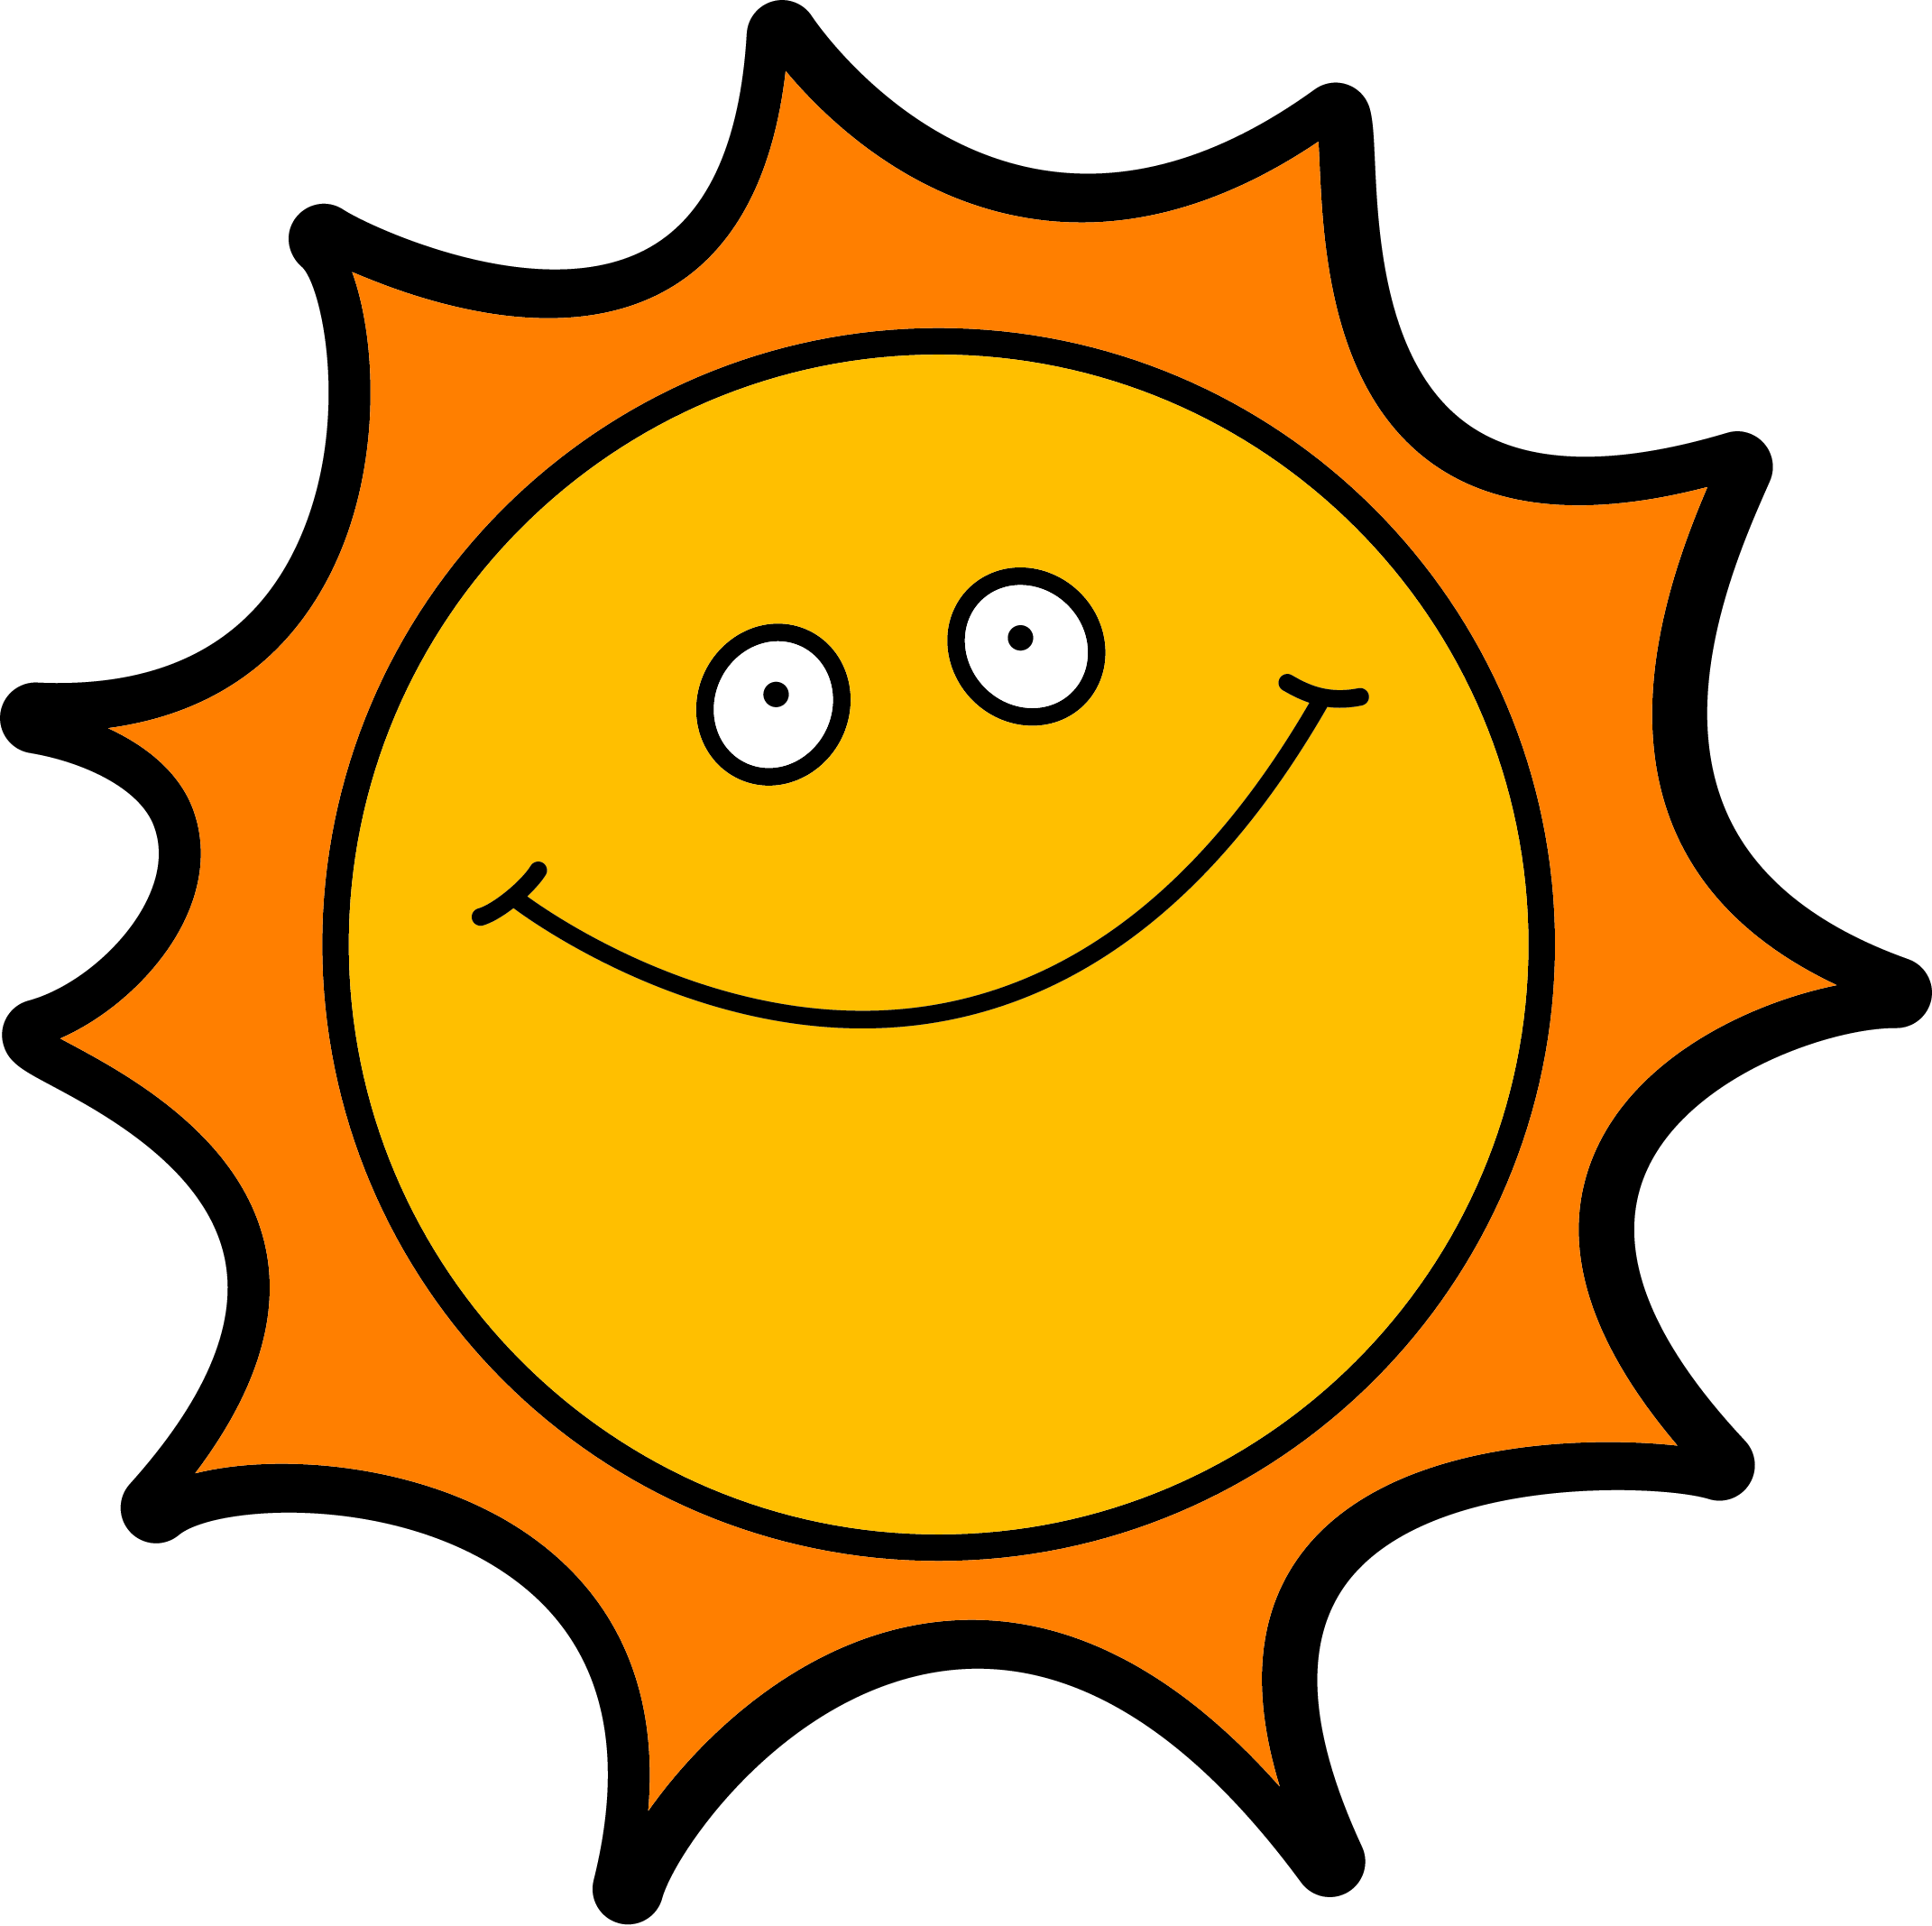 Bright clipart hot summer sun And sun art clipart public